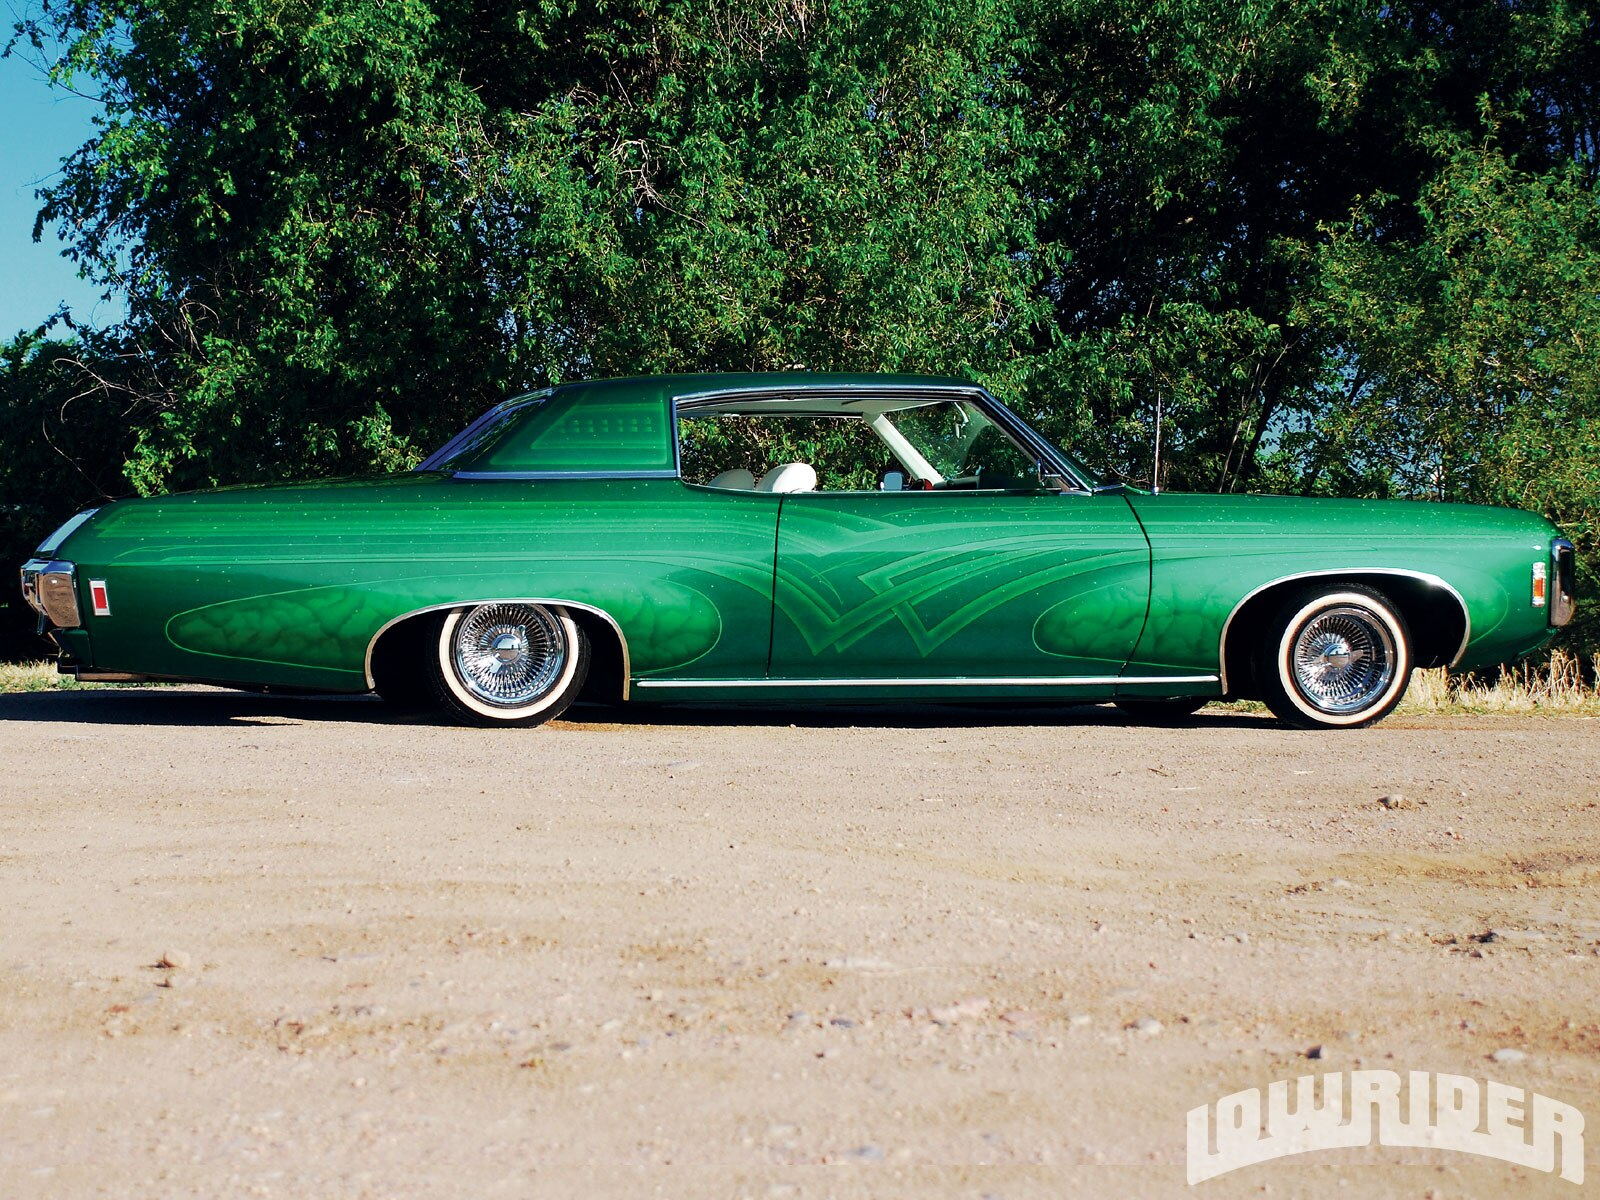 1969 chevrolet impala lowrider magazine. Black Bedroom Furniture Sets. Home Design Ideas